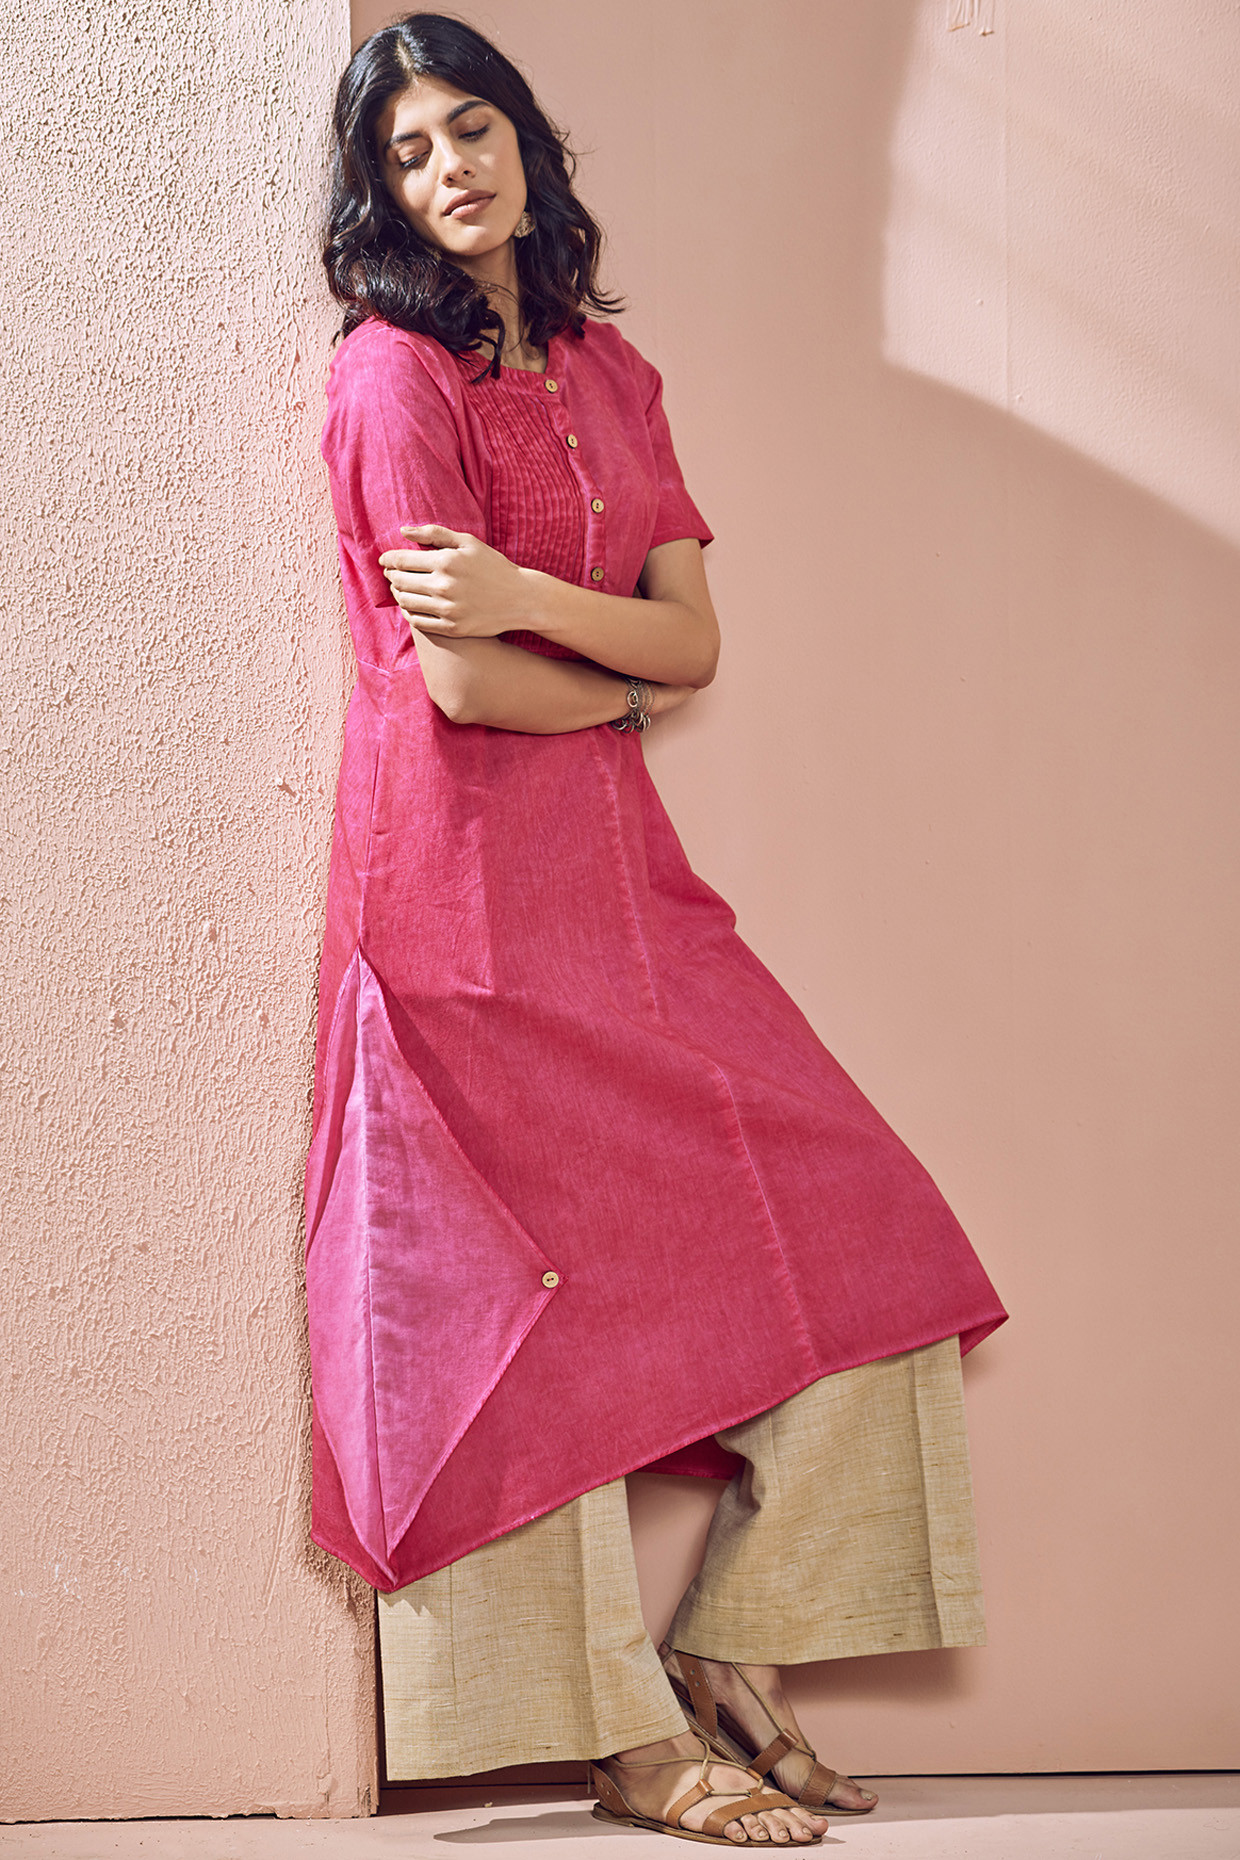 Blush Pink Tie Dyed Adhira Kurti by House Of Idar